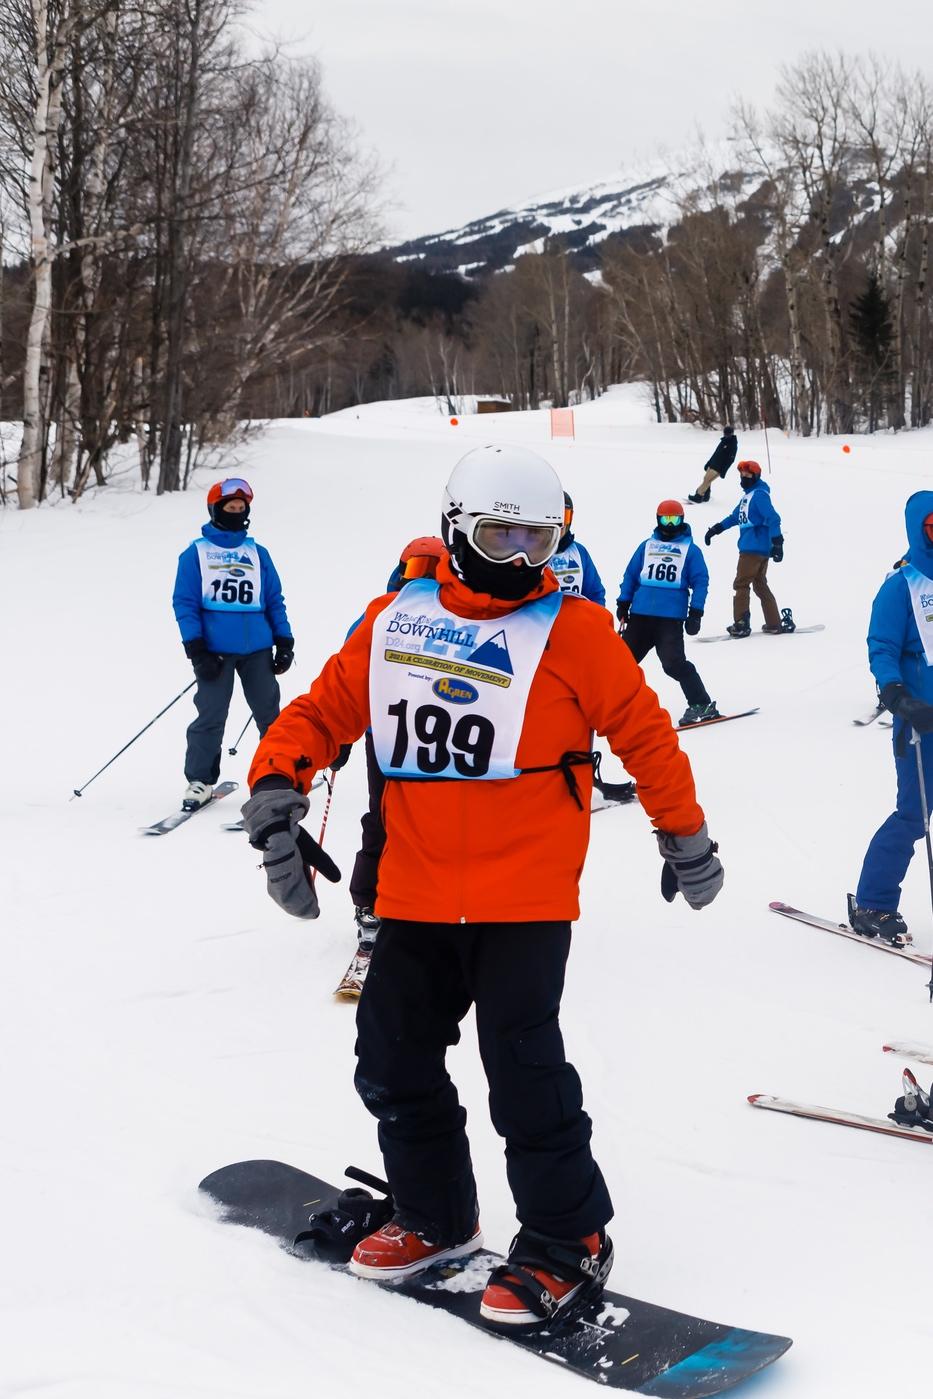 WinterKids Downhill 24 2021 SDP 2888